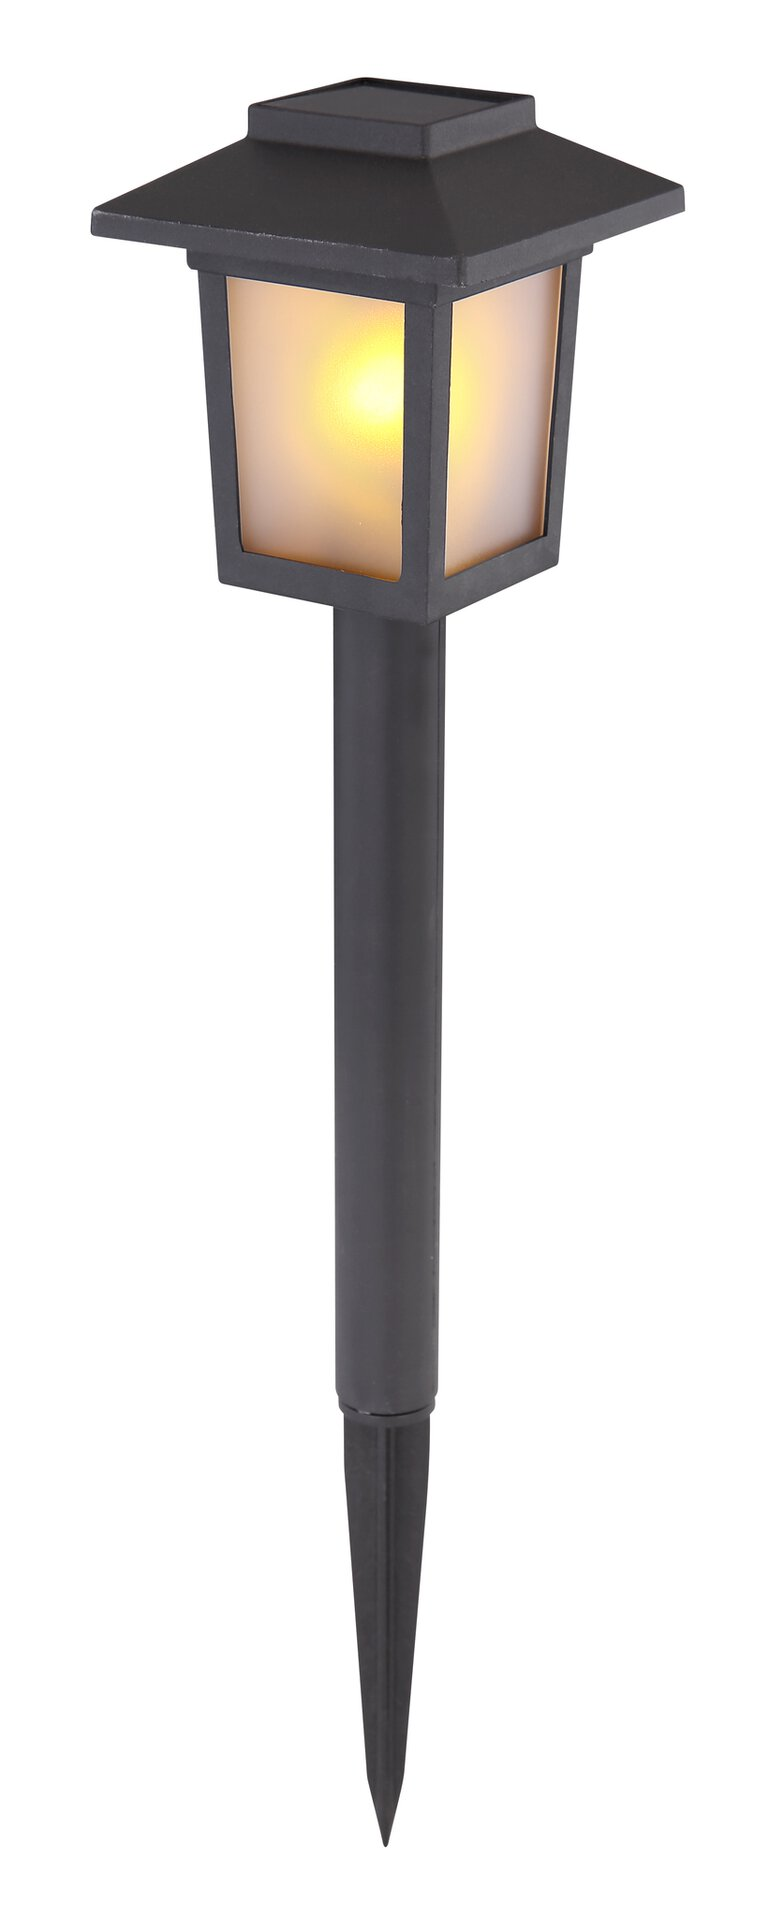 Solarleuchte Solar 3-er Set Globo Kunststoff schwarz 8 x 37 x 8 cm